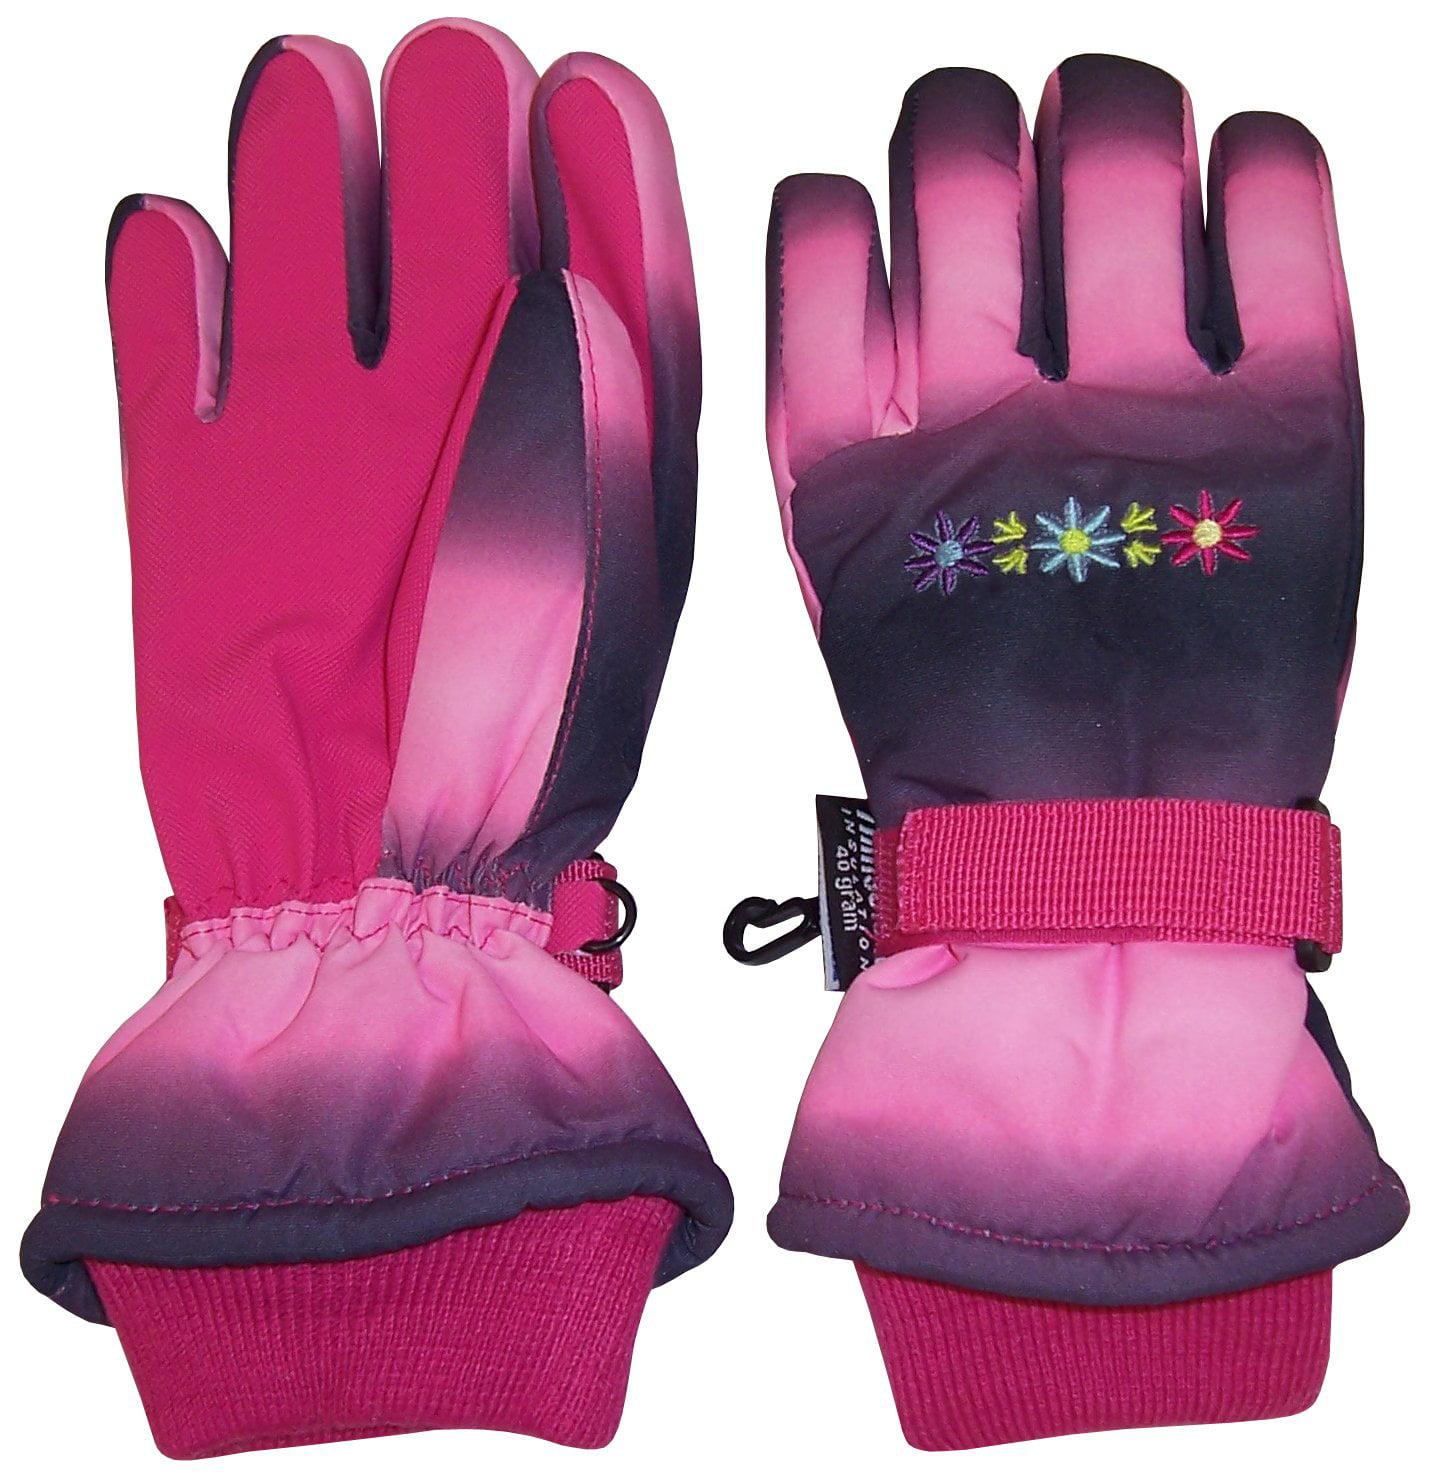 NICE CAPS Girls Waterproof and Thinsulate Insulated Multi Color Tye Dye Floral Ski Snow... by Harold J. Lehman Industries Inc.